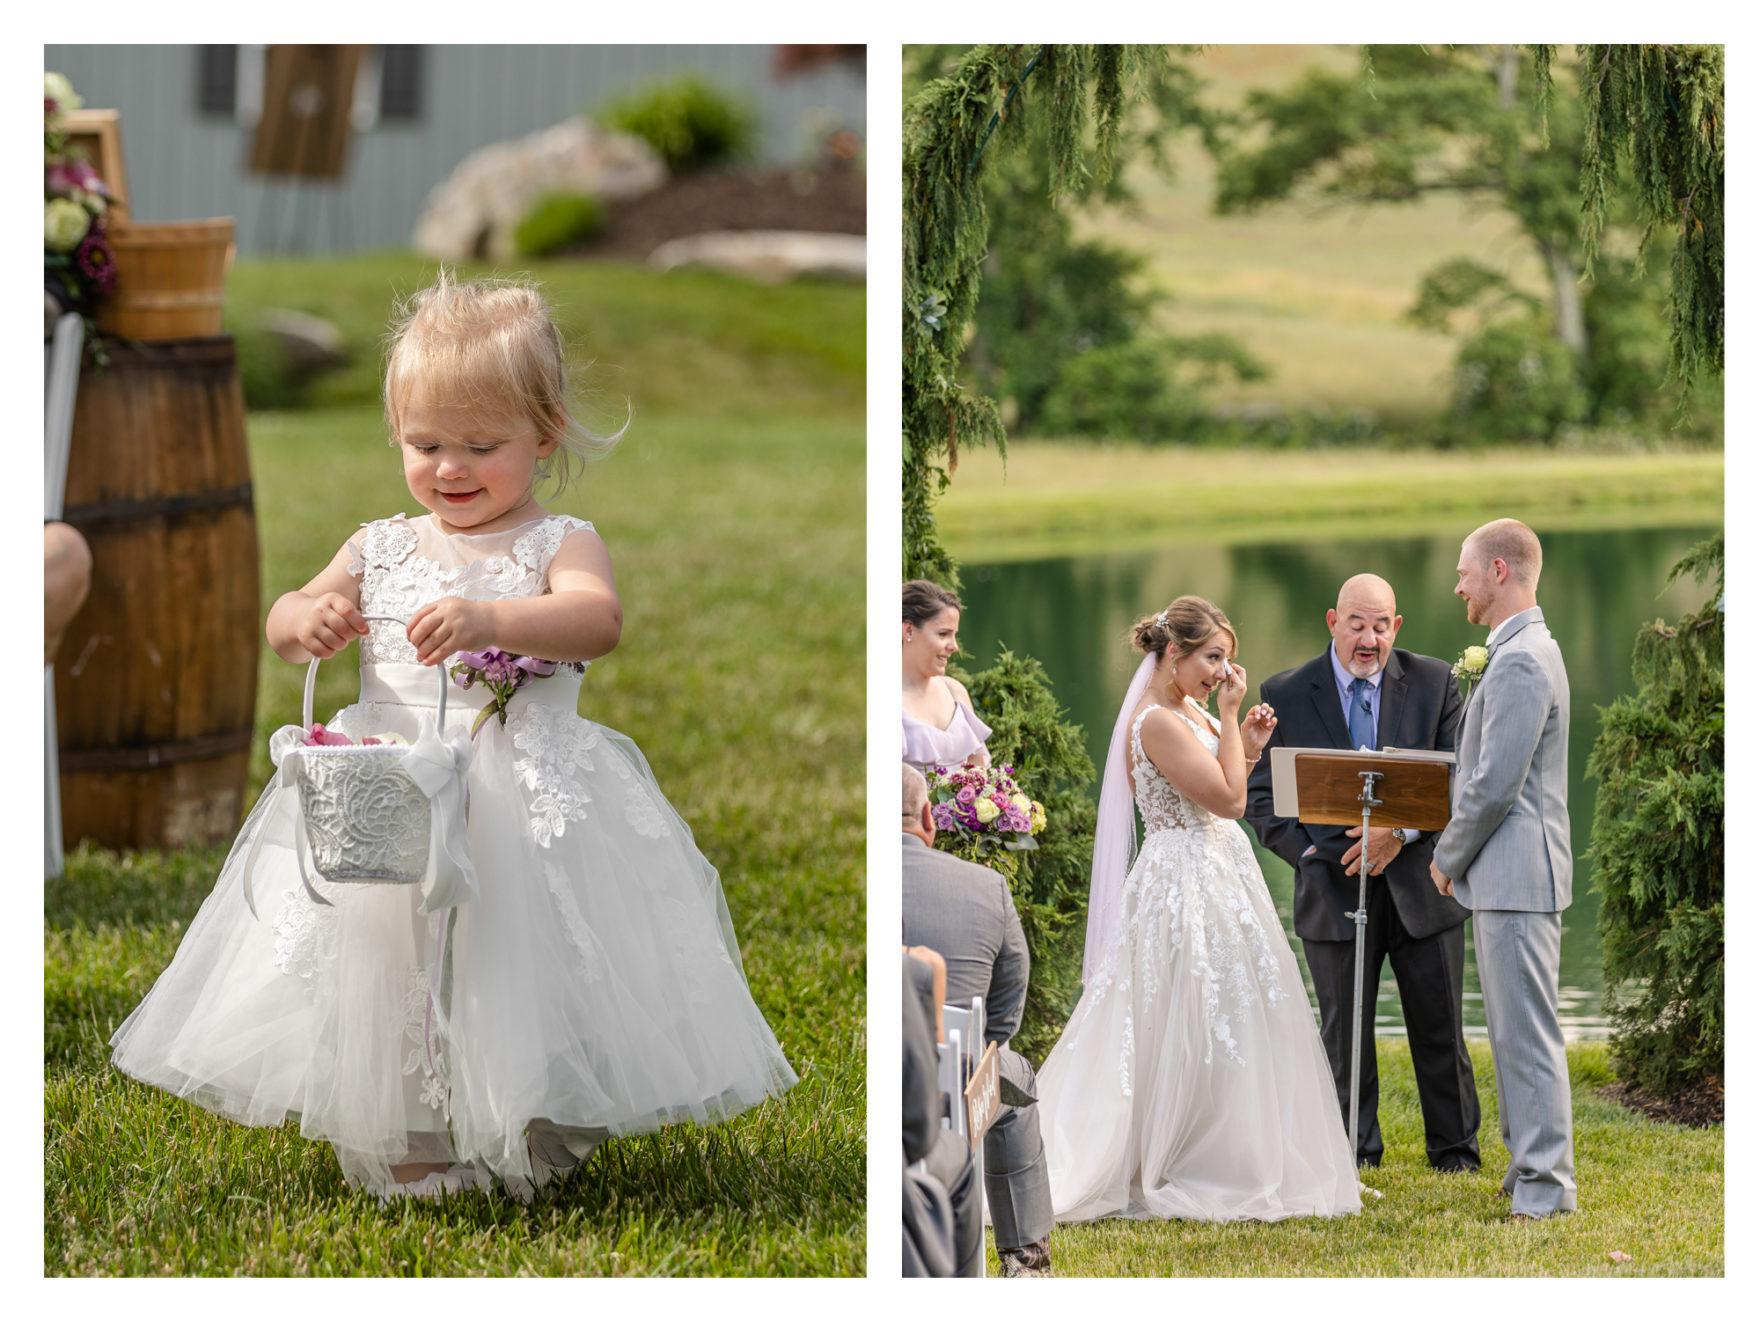 Summer Wedding Stone Ridge Hollow June Wedding Lavender dresses flower girl bride